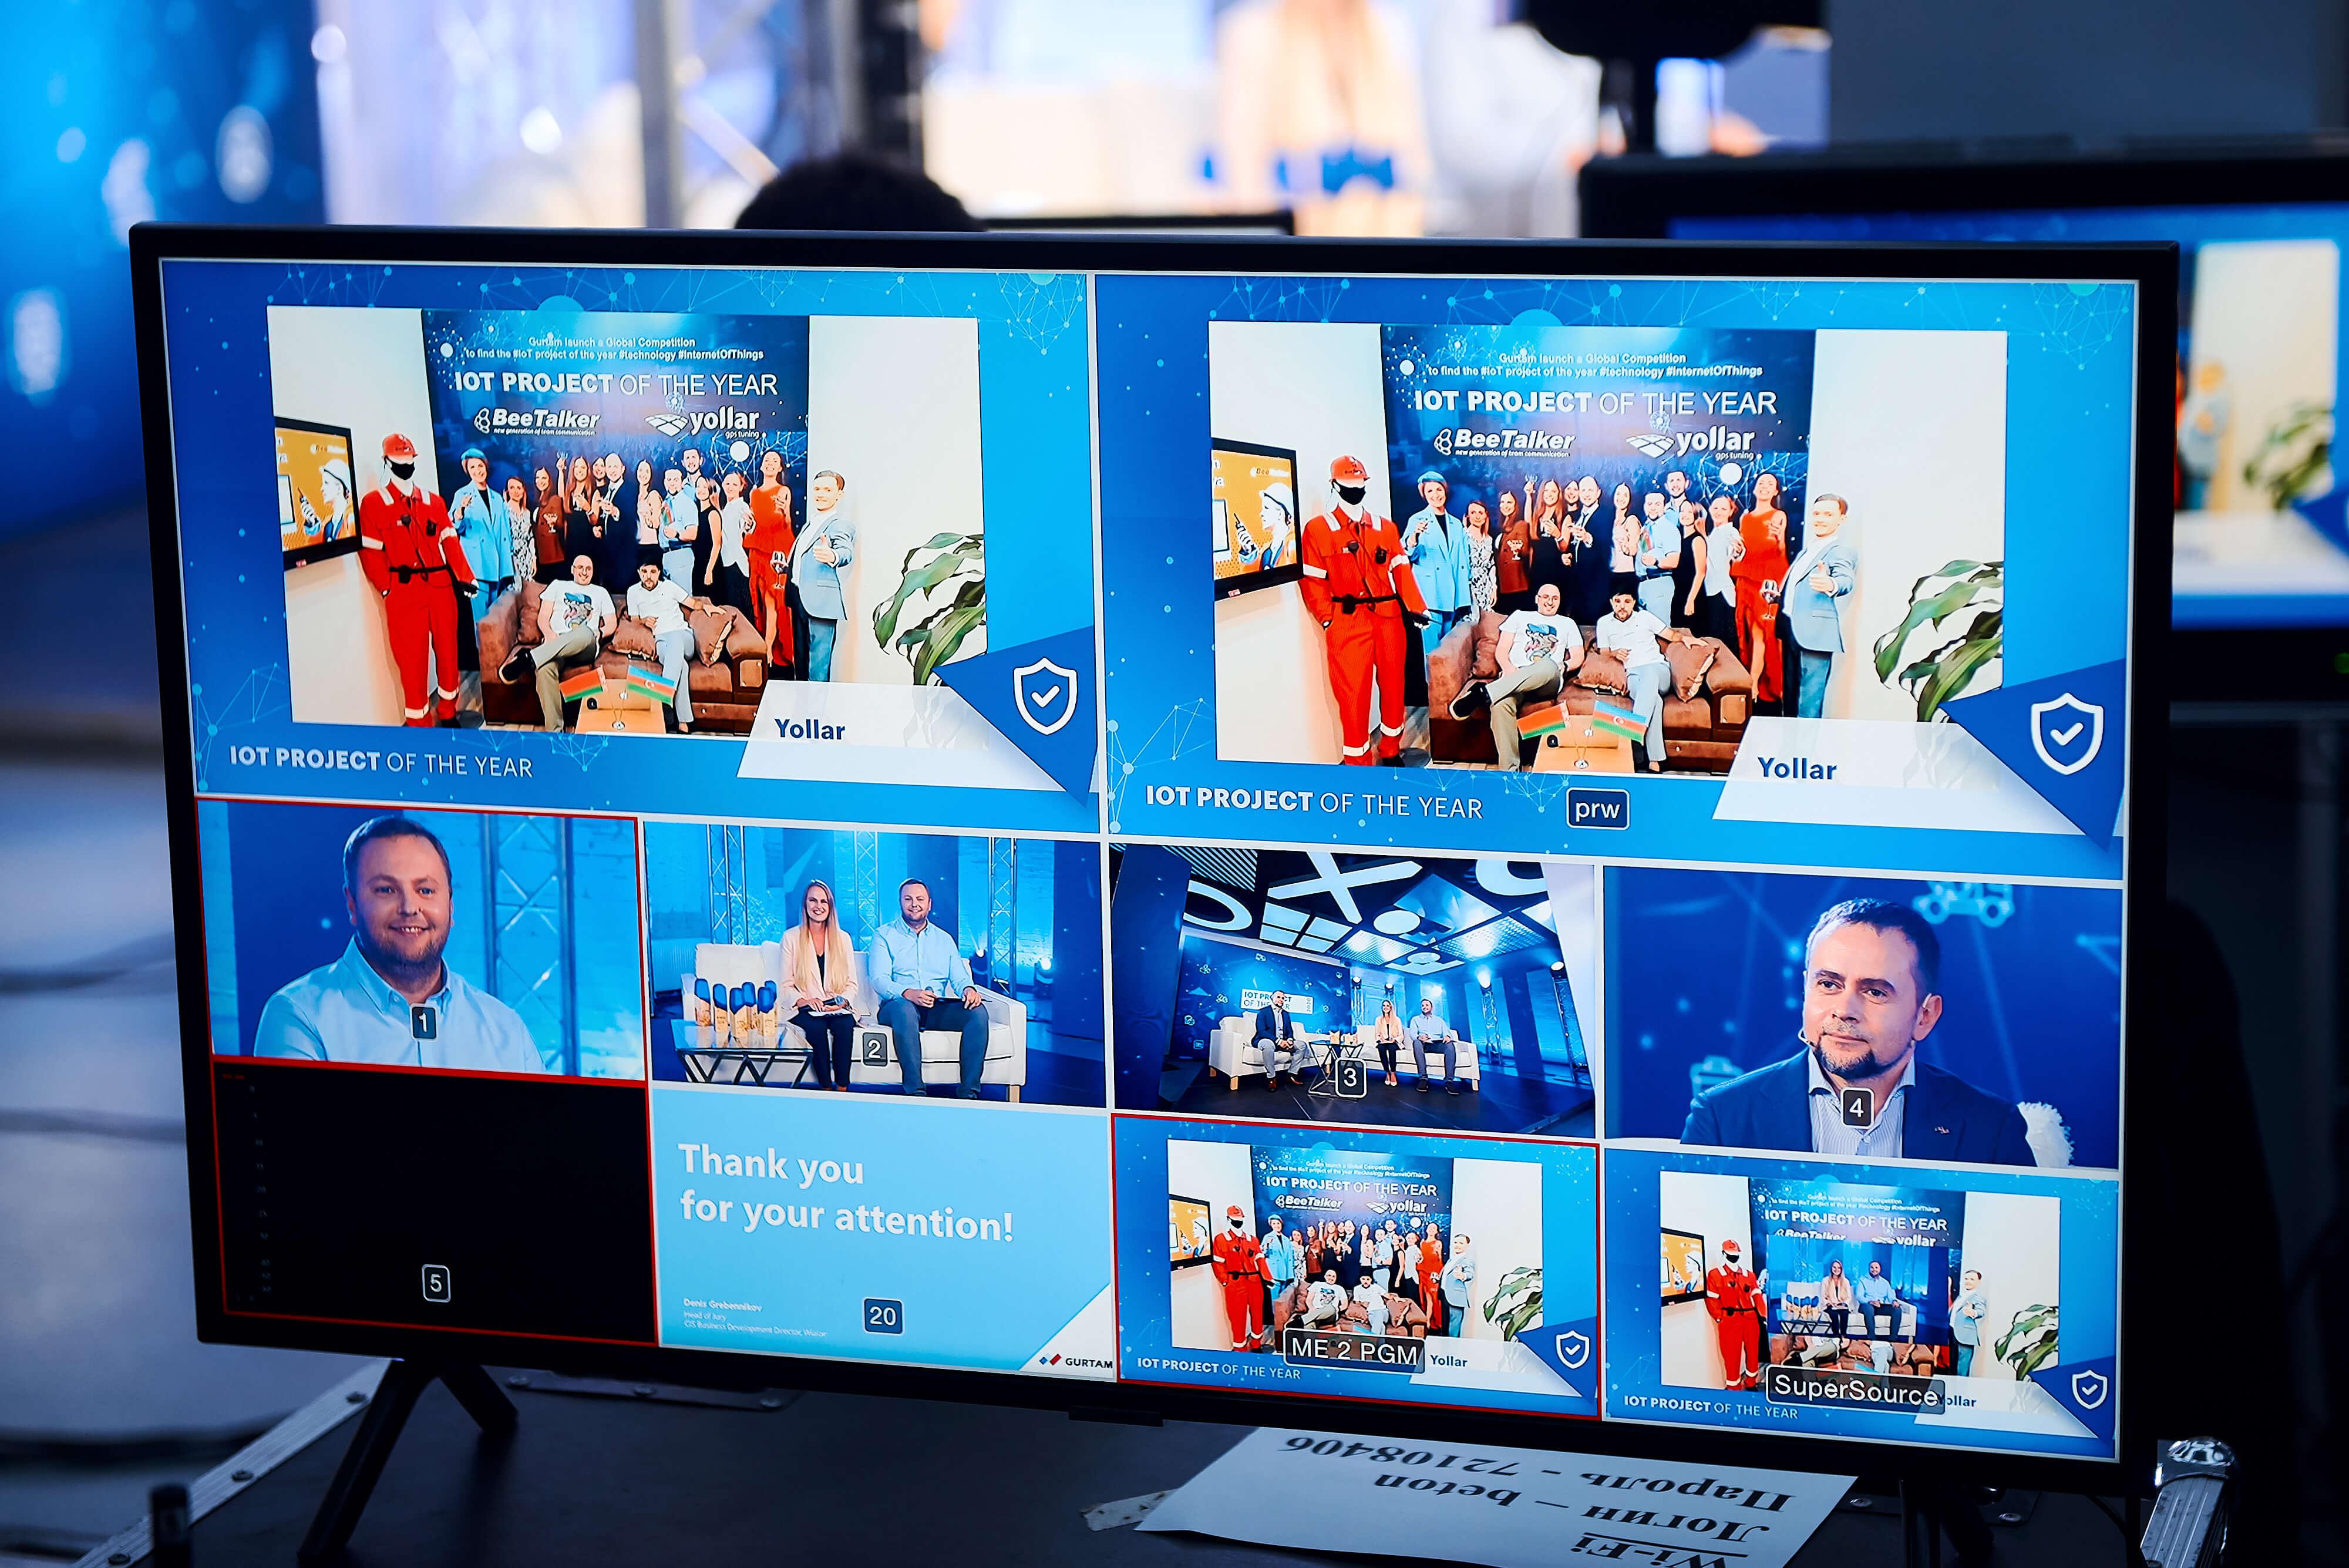 Команда Yollar на церемонии награждения IoT project of the year